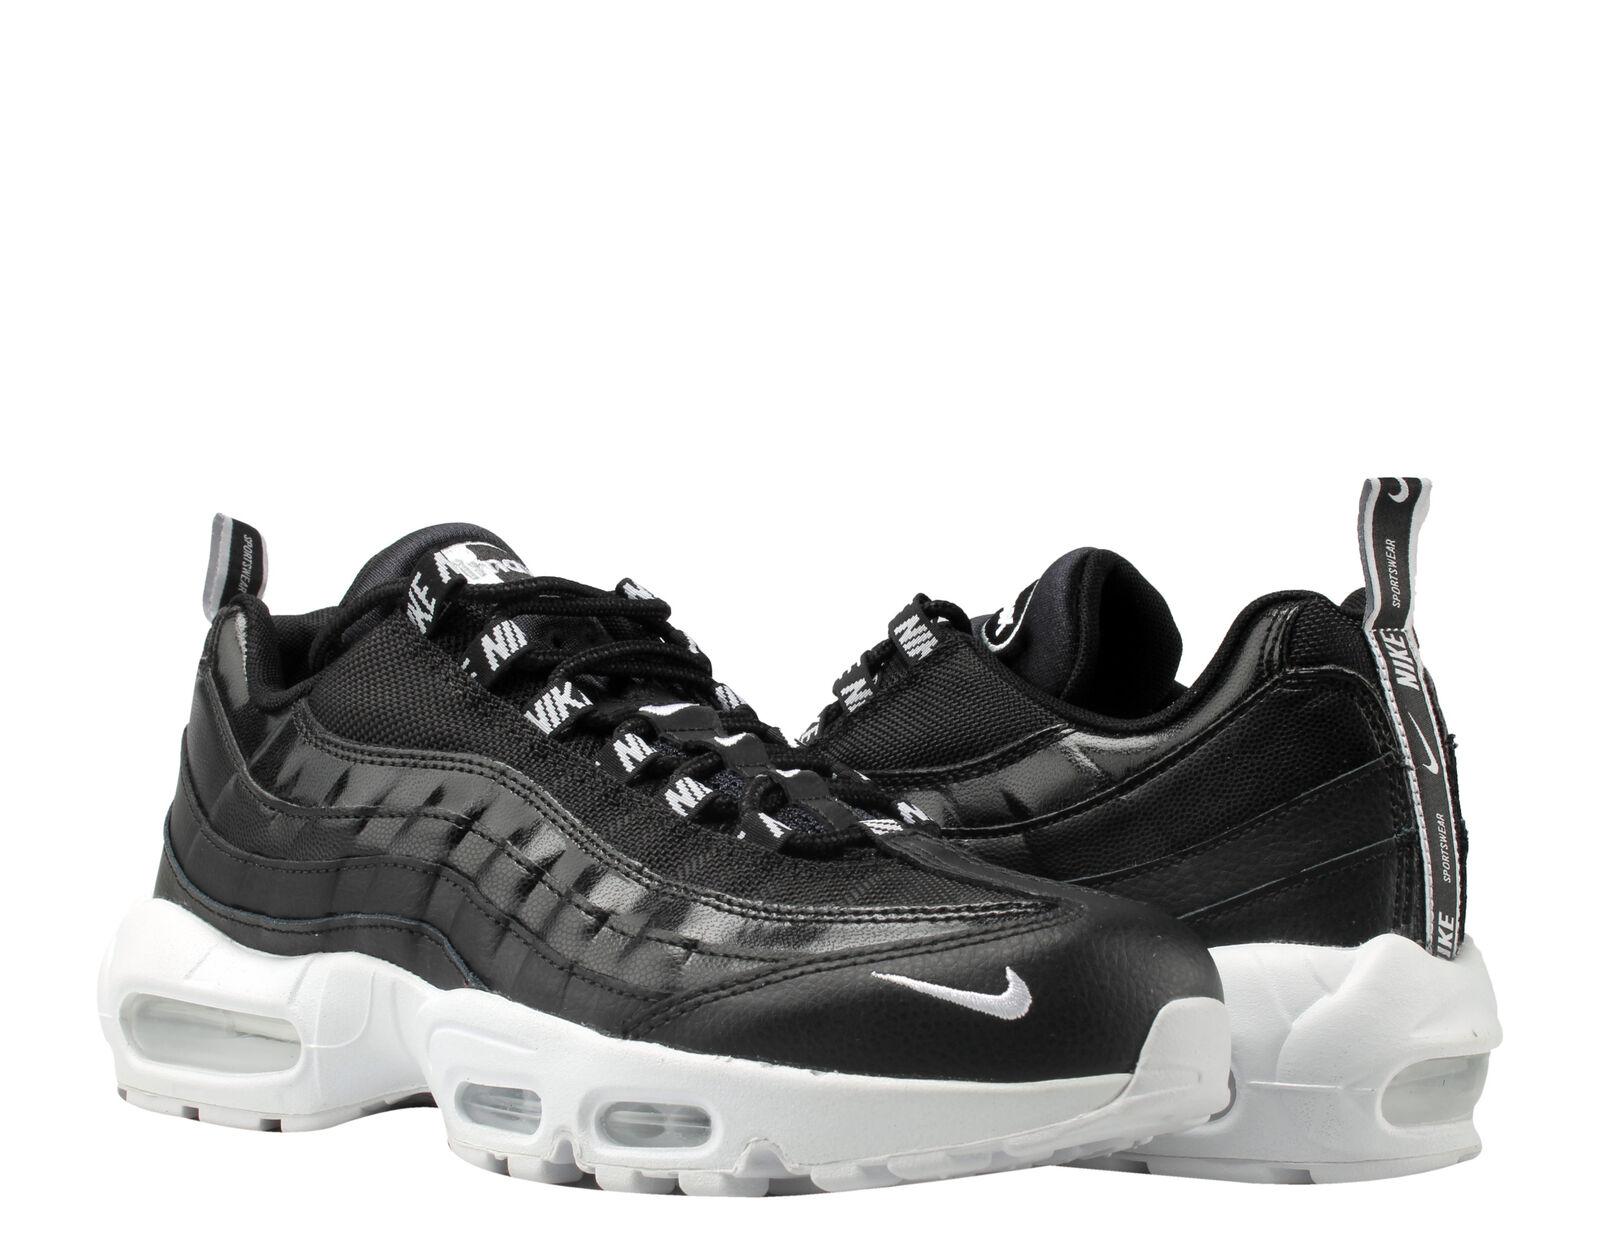 Nike Air Max 95 Black White-Black OverBranded Men's Running shoes 538416-020